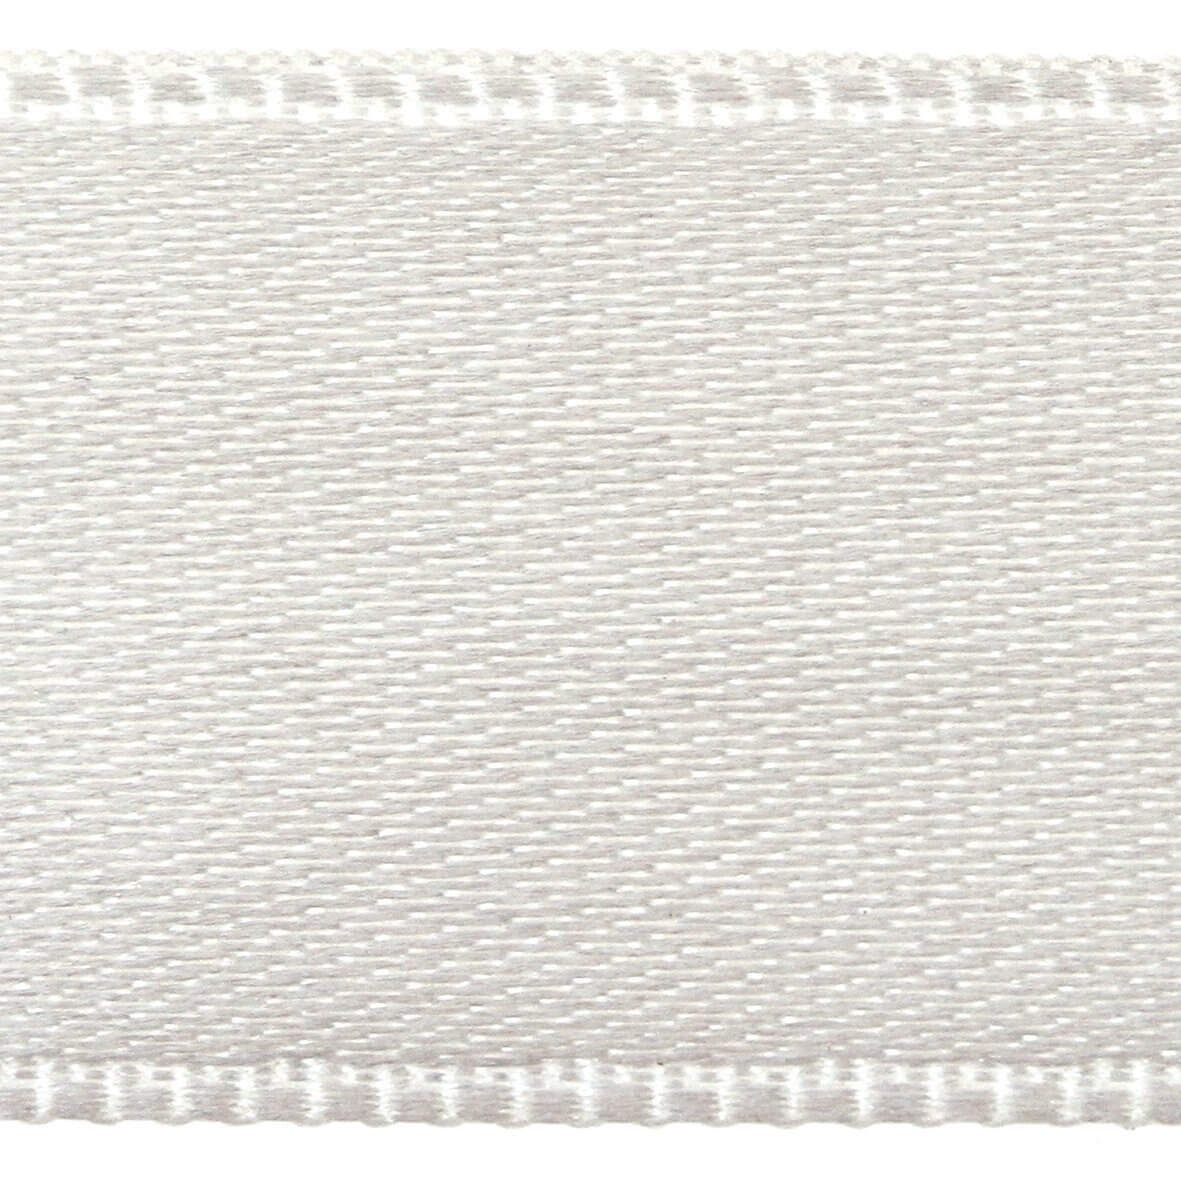 Bridal White Col. 537 - 25mm Satab Satin Ribbon